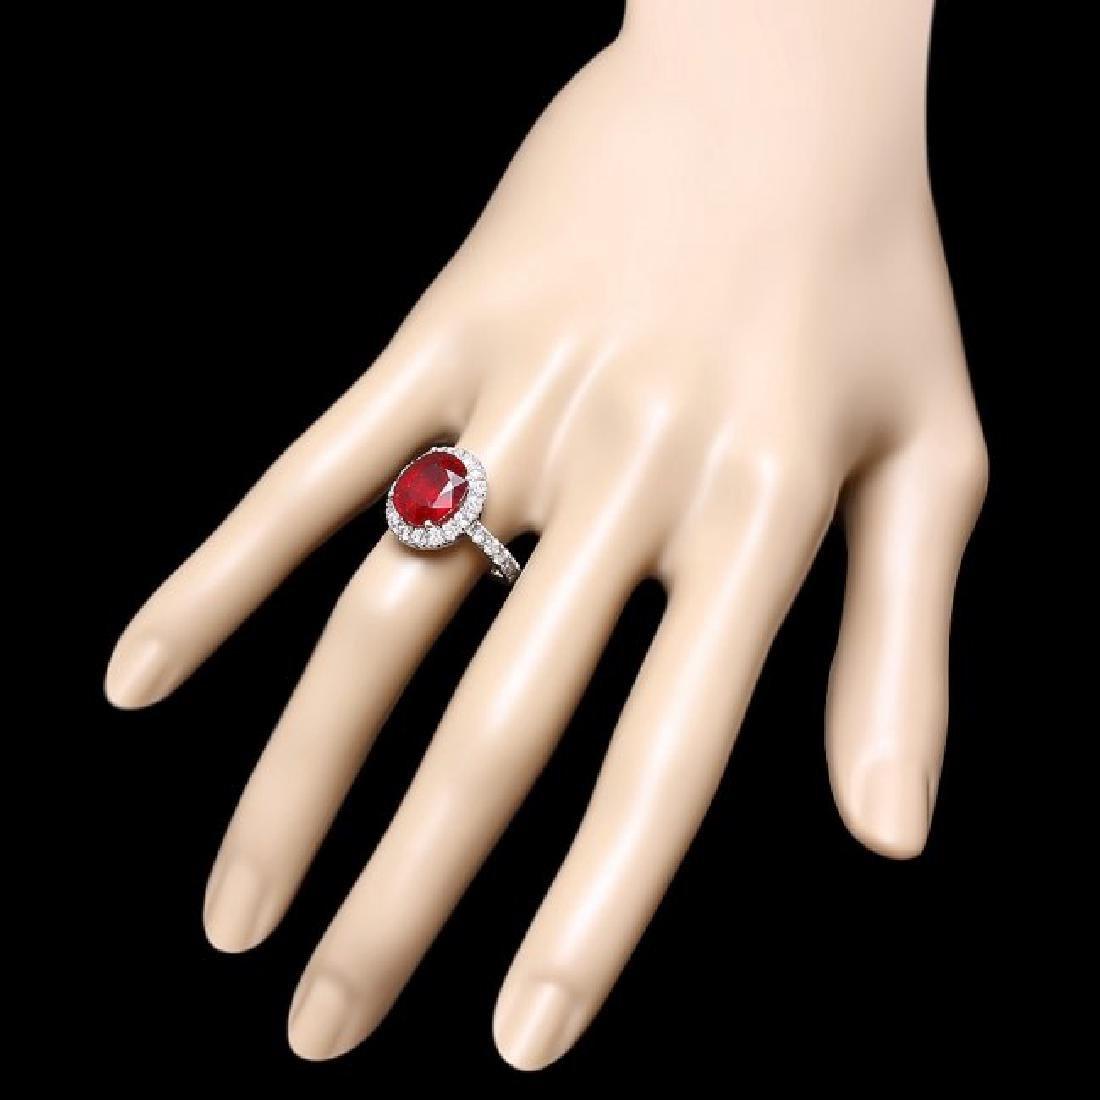 14k White Gold 5.00ct Ruby 1.40ct Diamond Ring - 3